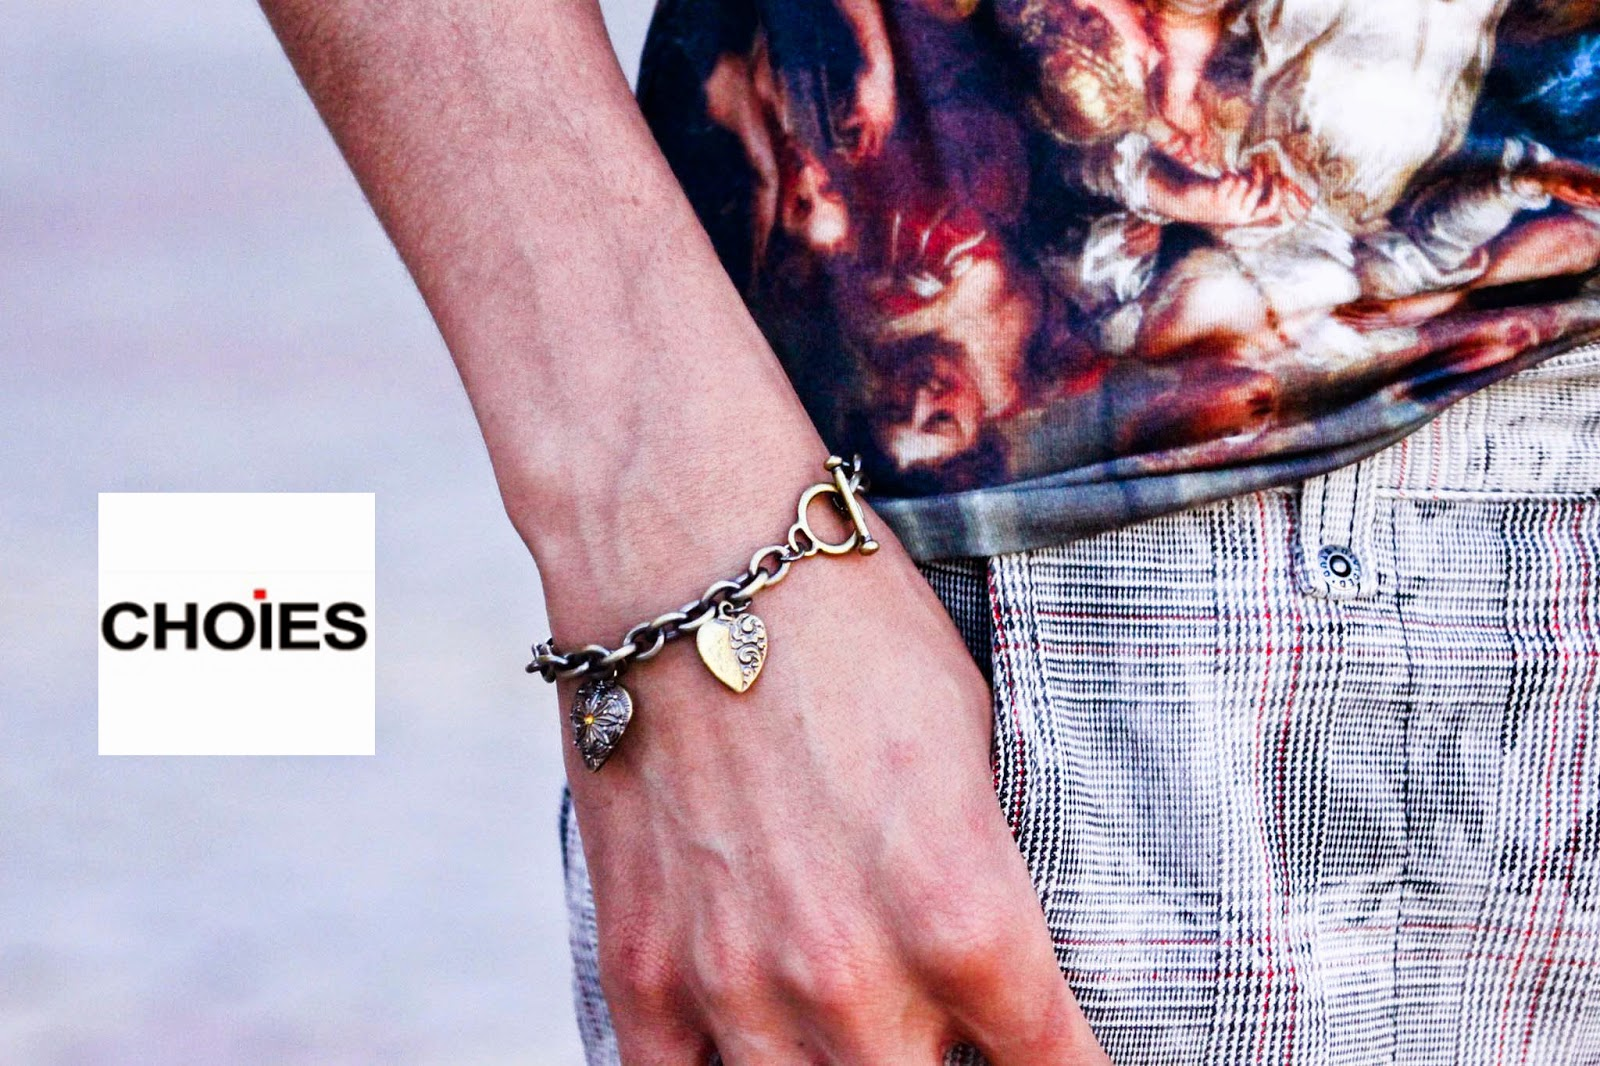 http://www.choies.com/product/celebona-chain-bracelet-with-heart?cid=5150beryl